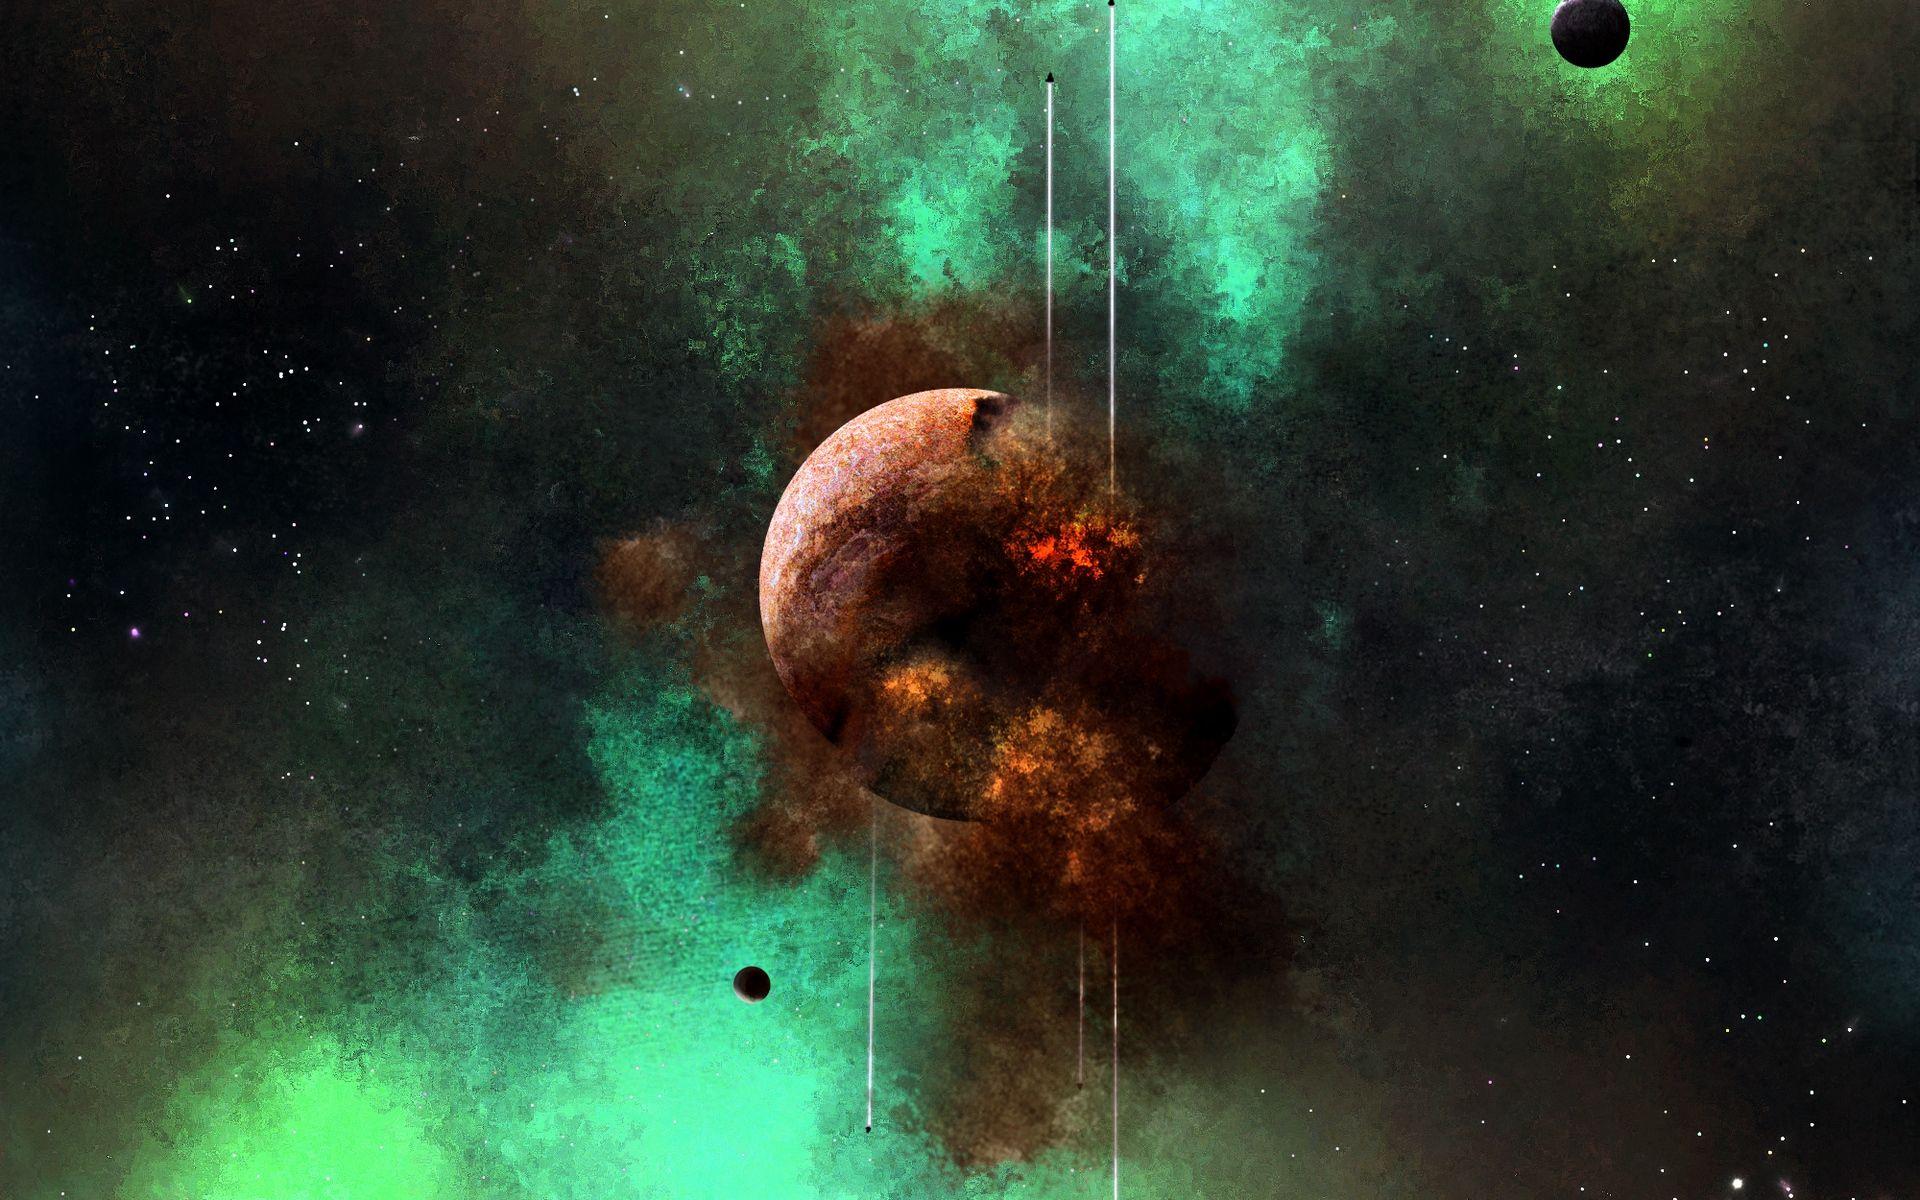 Planet Destruction View Hd Wallpaper Wallpaper Hd Wallpaper Planets